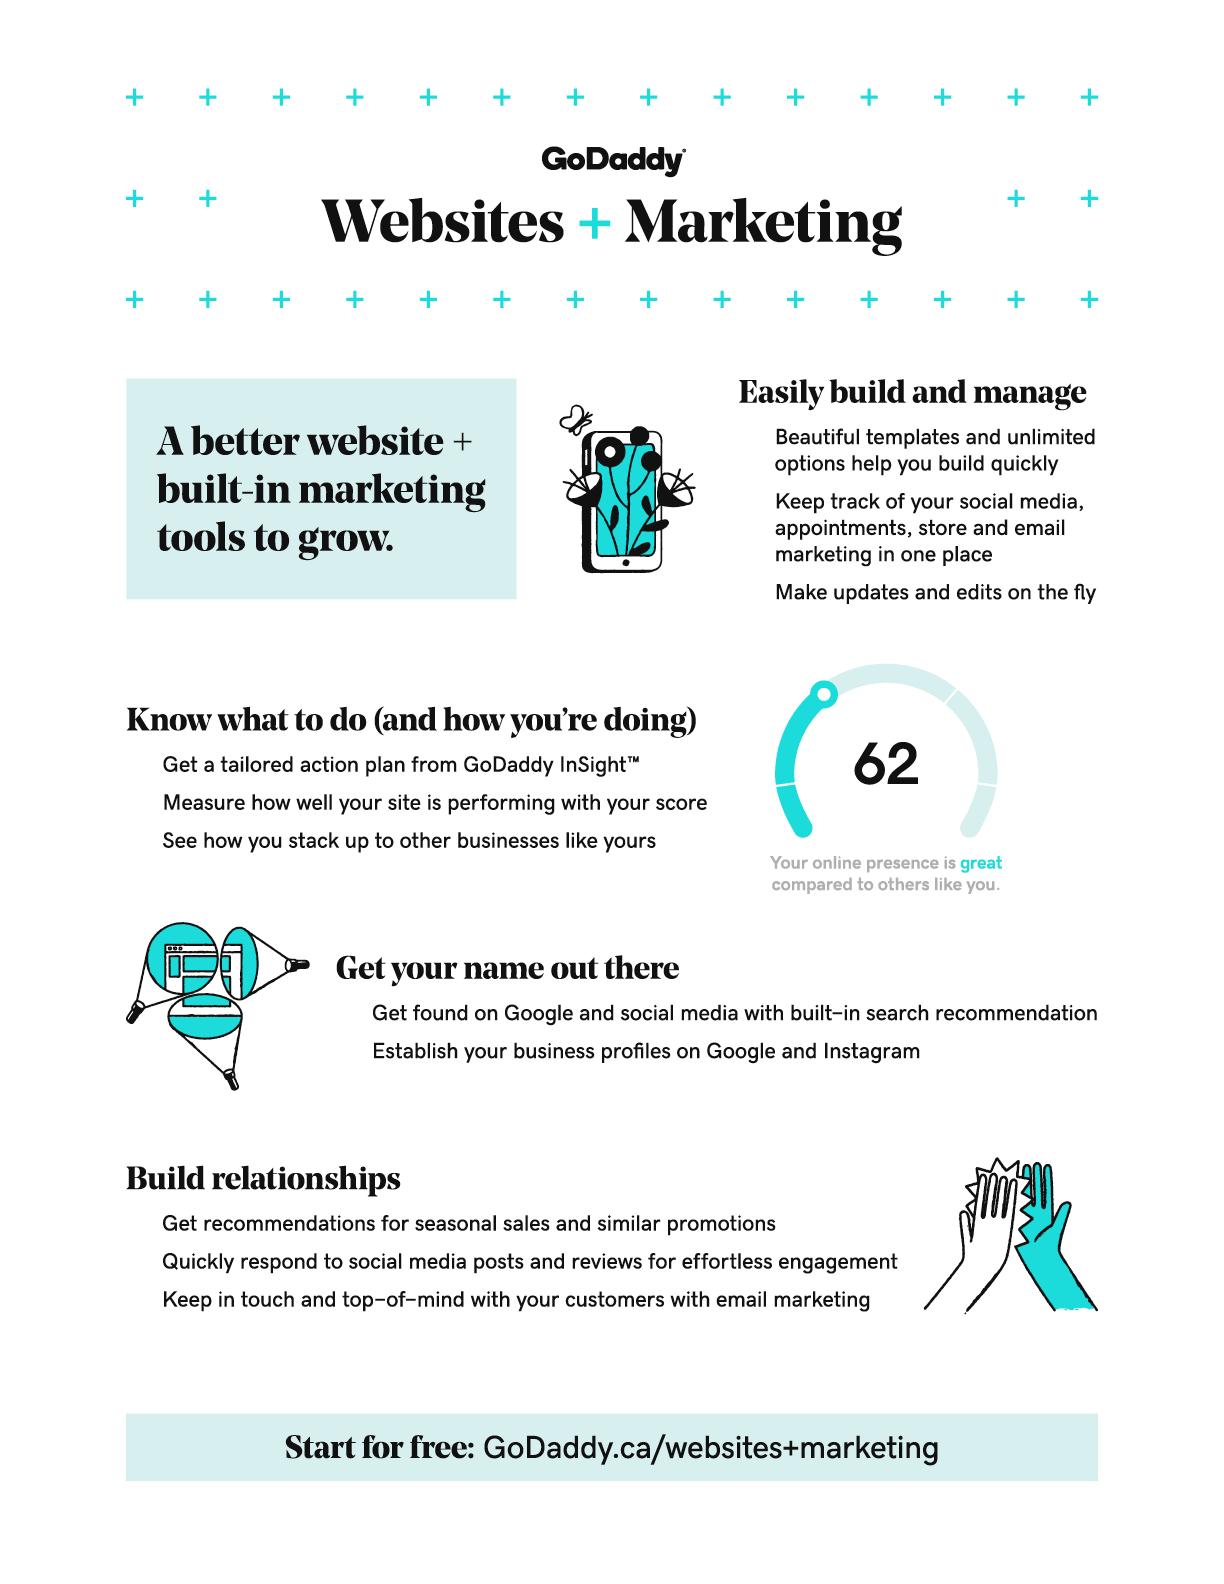 Web Marketing W+M Infographic